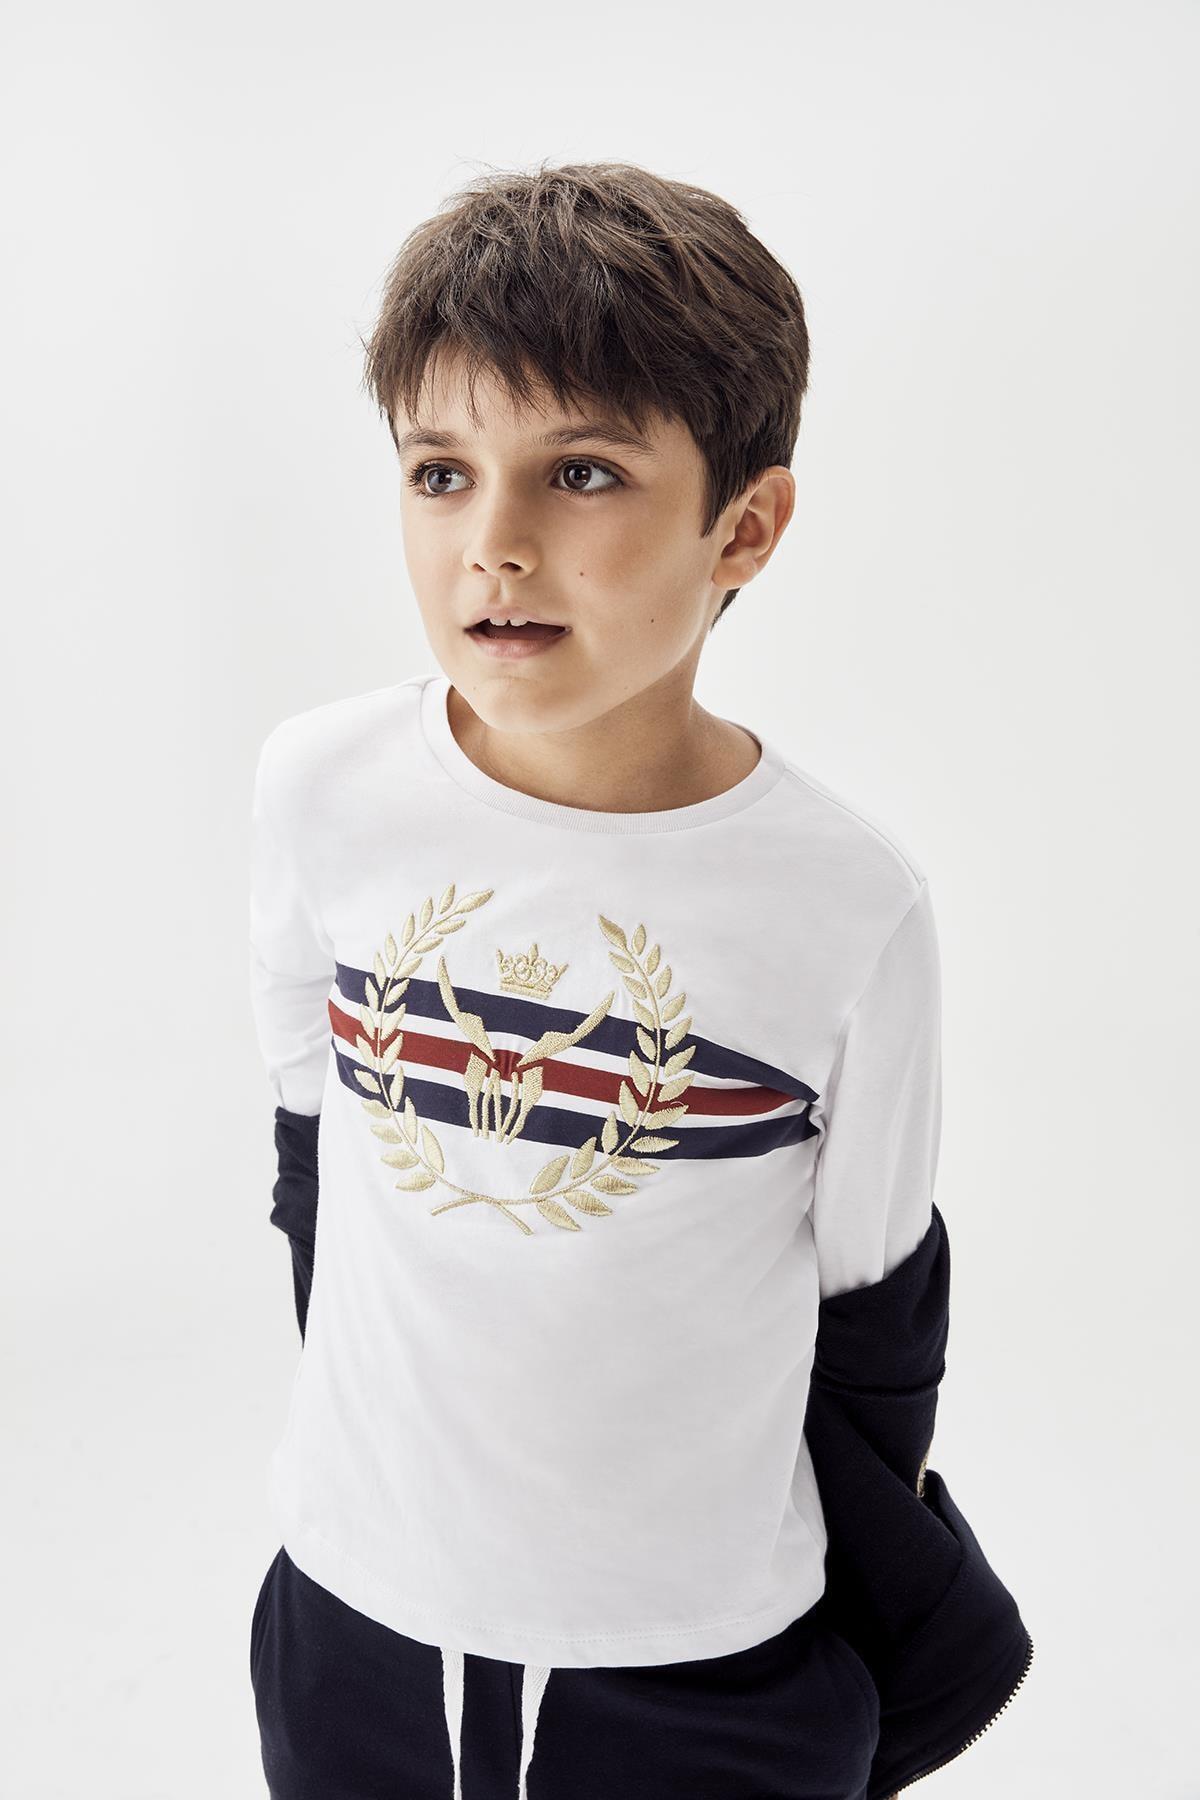 Nebbati Erkek Çocuk Beyaz T-shirt 20fw0nb3514 1